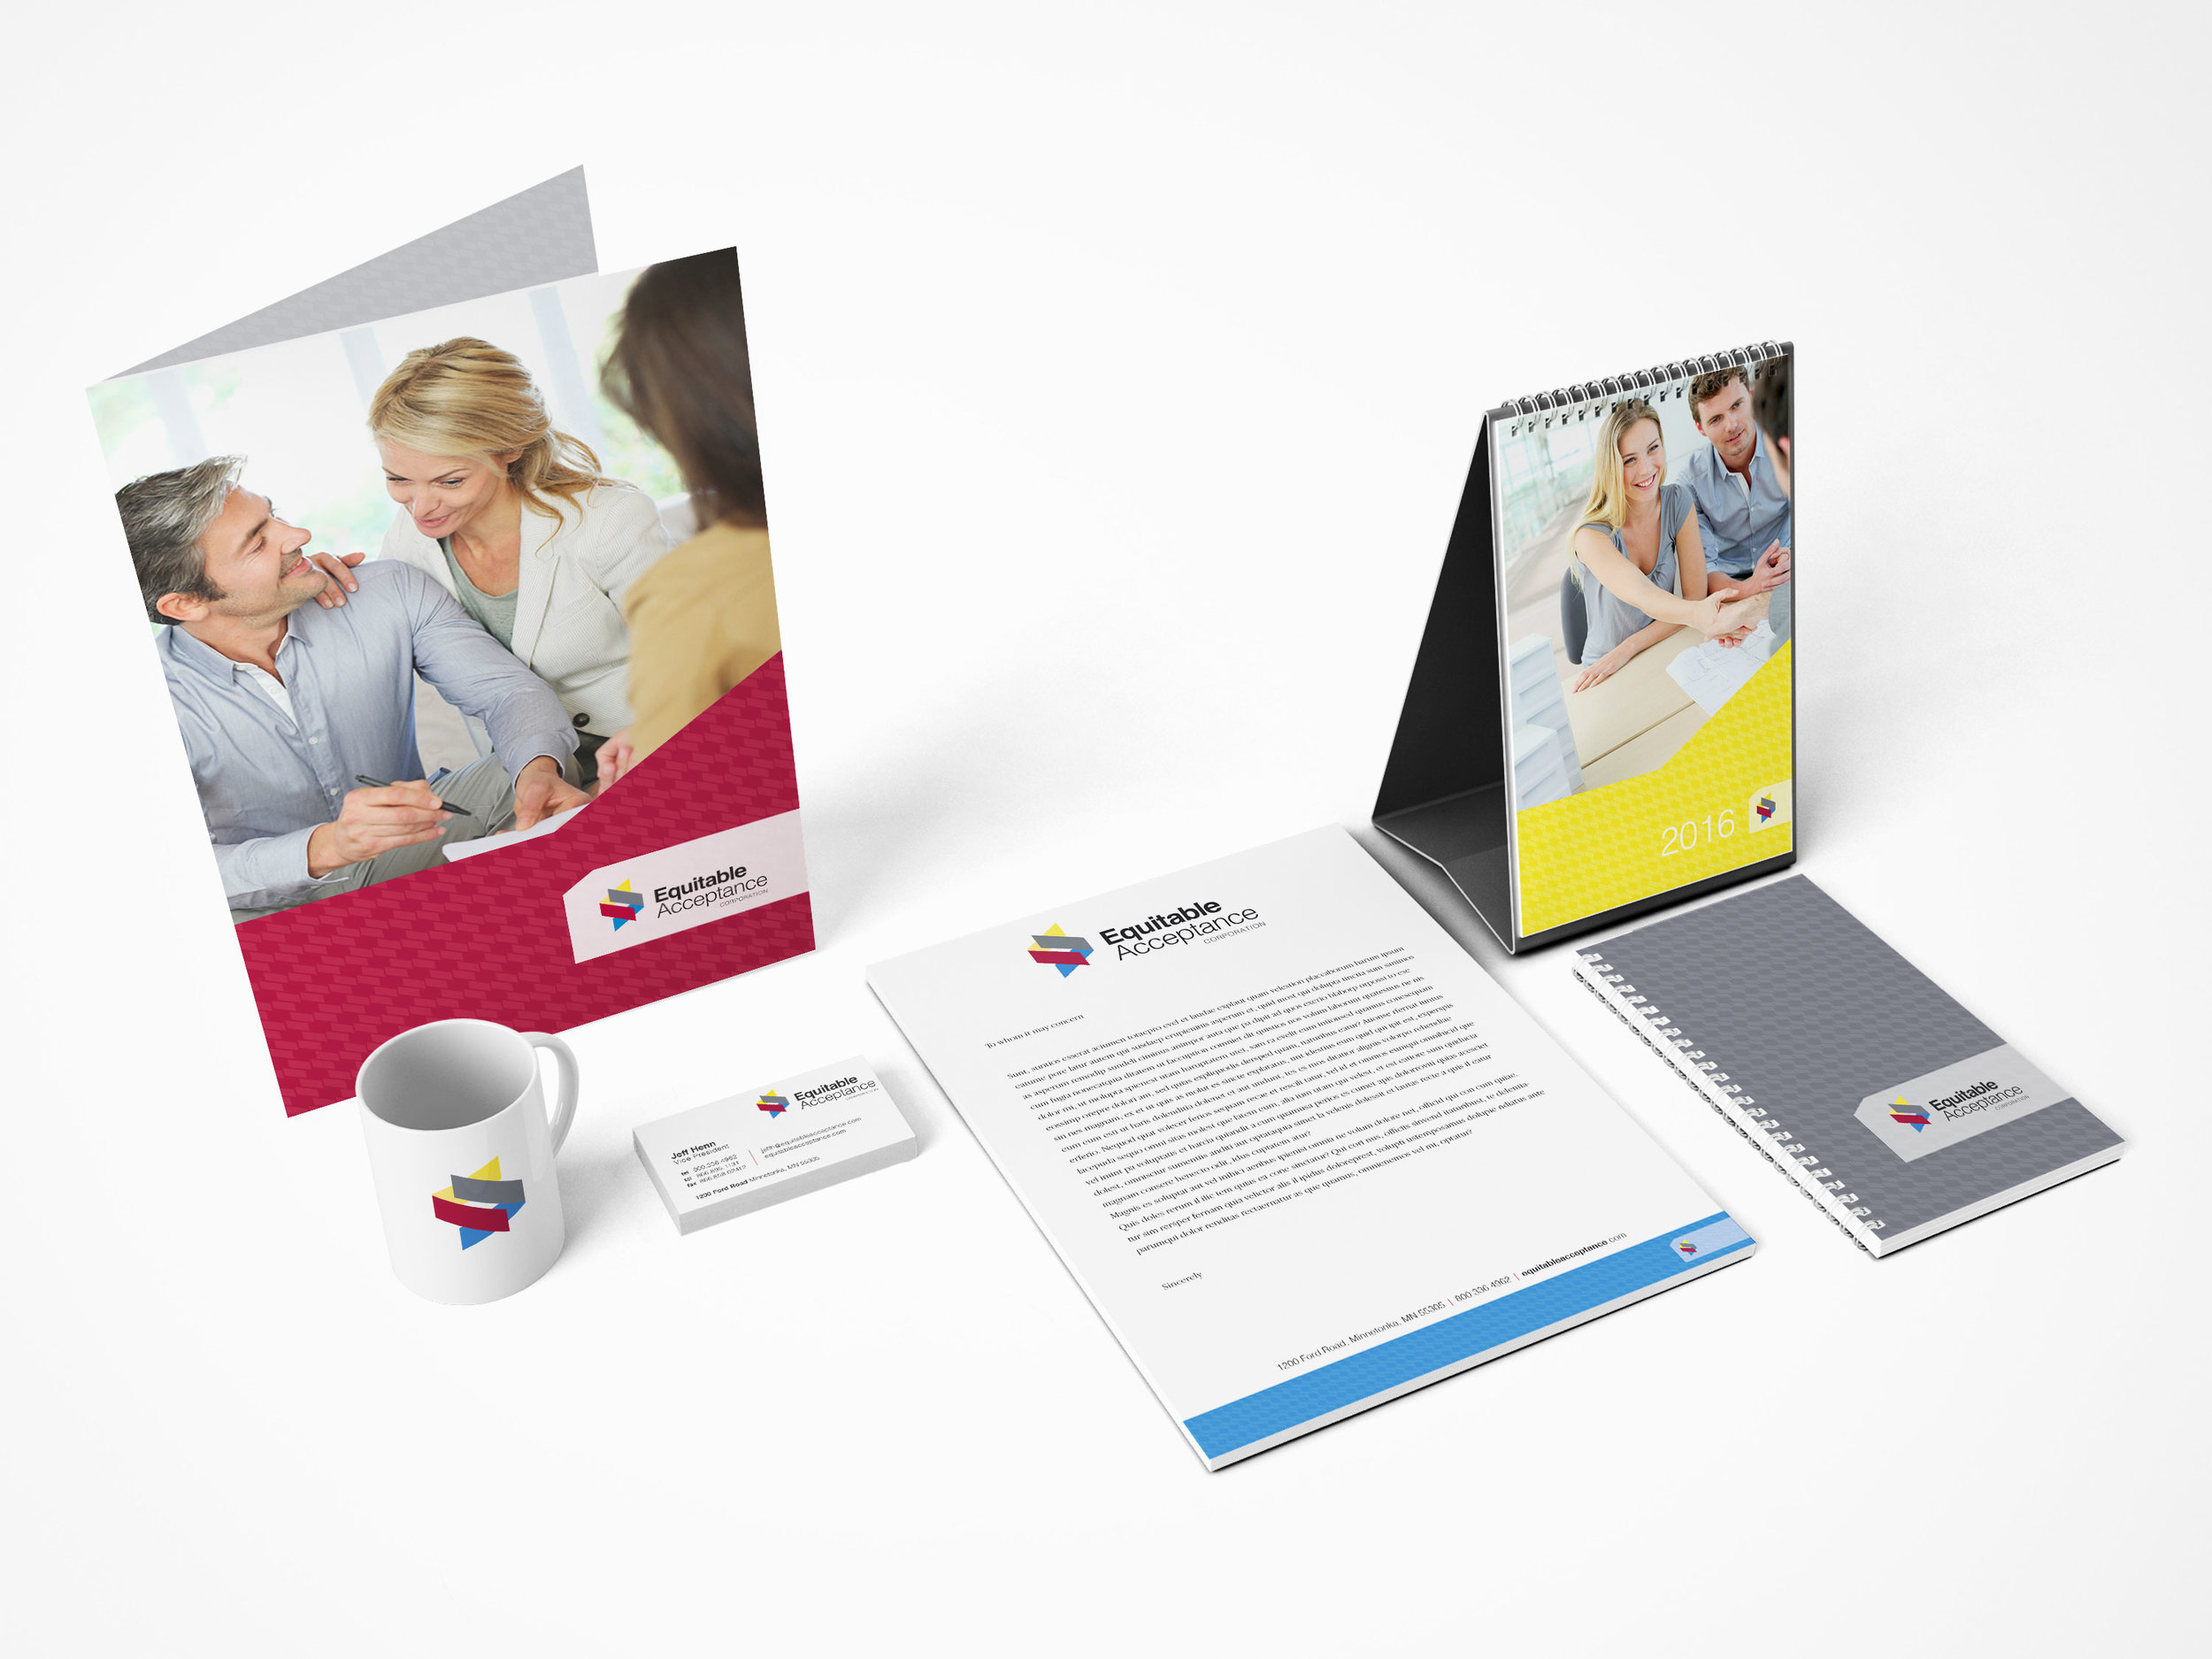 creativemccoy-design-equitableacceptance-branding-2.jpg